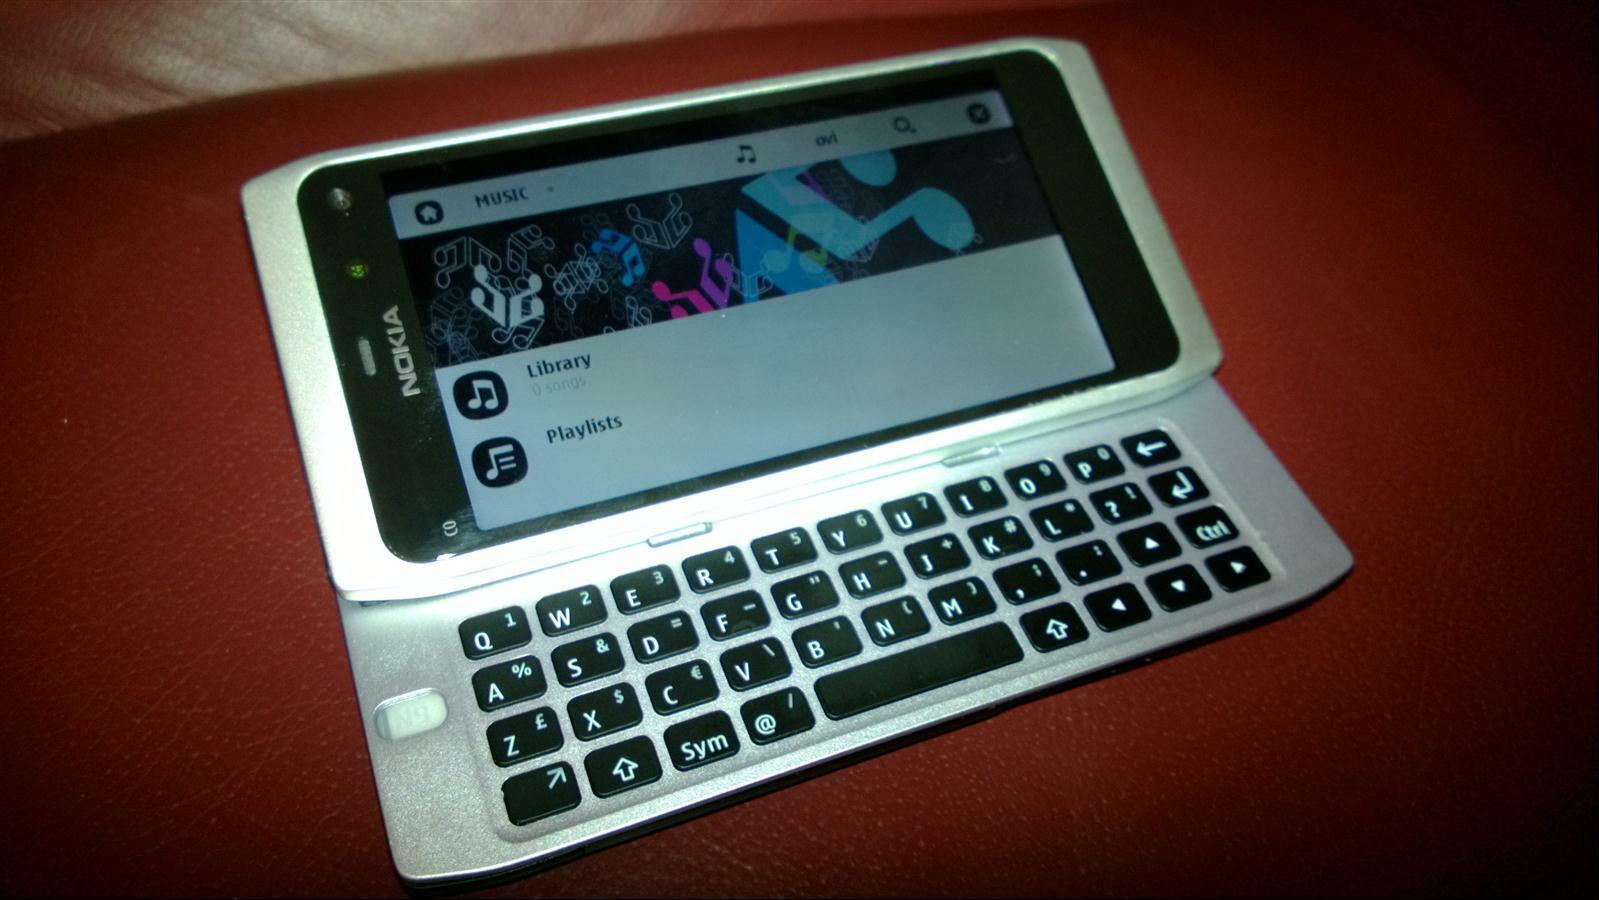 N950_ProtoS1_Swipe_8